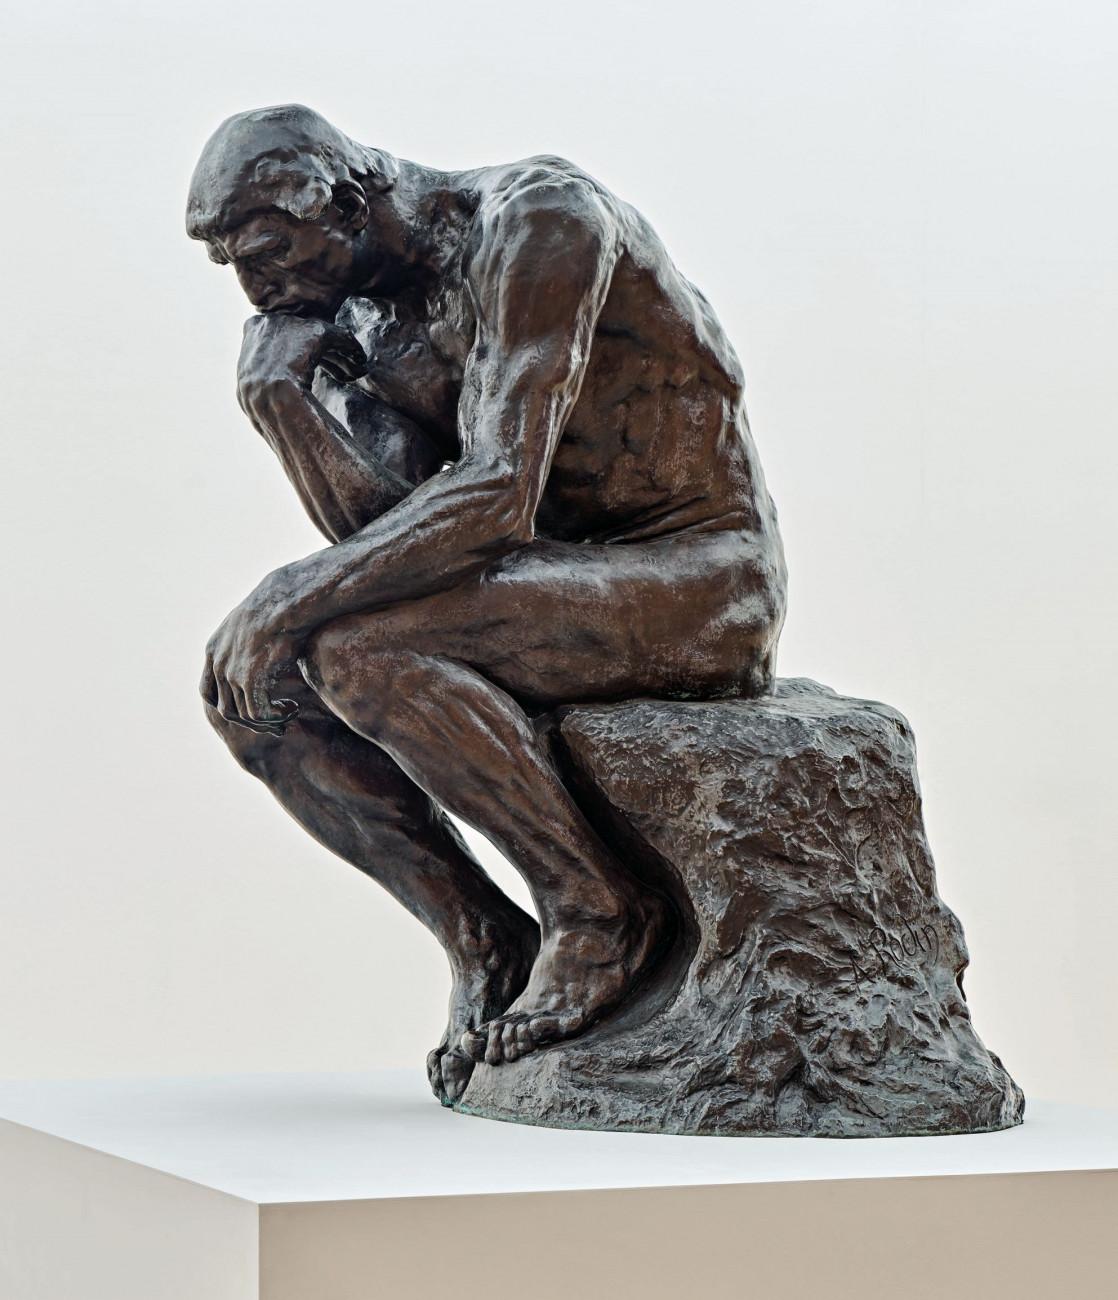 Rodin / Arp, Rodin / Arp Mark Niedermann